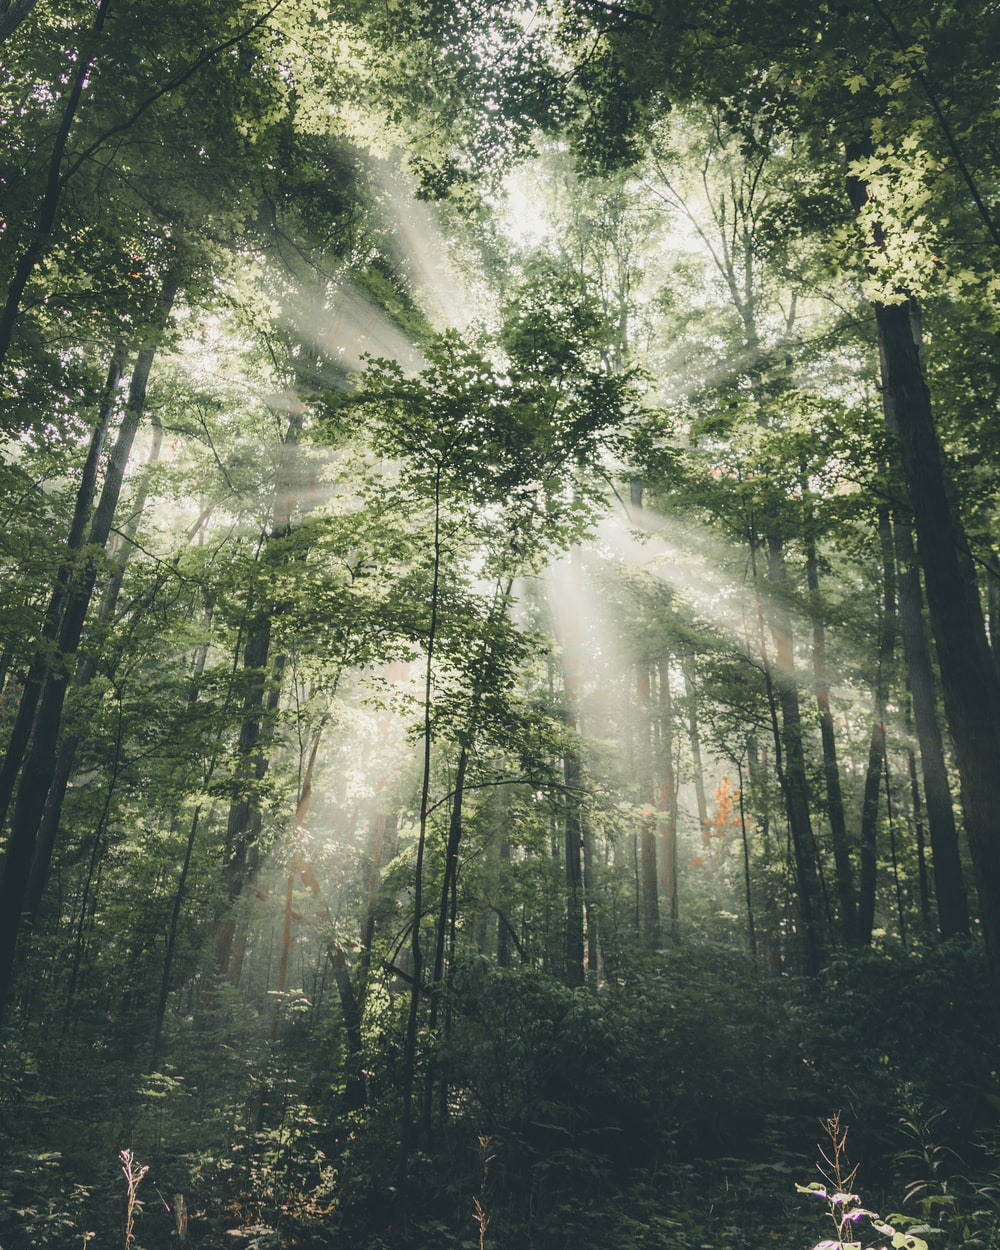 light piercing through trees